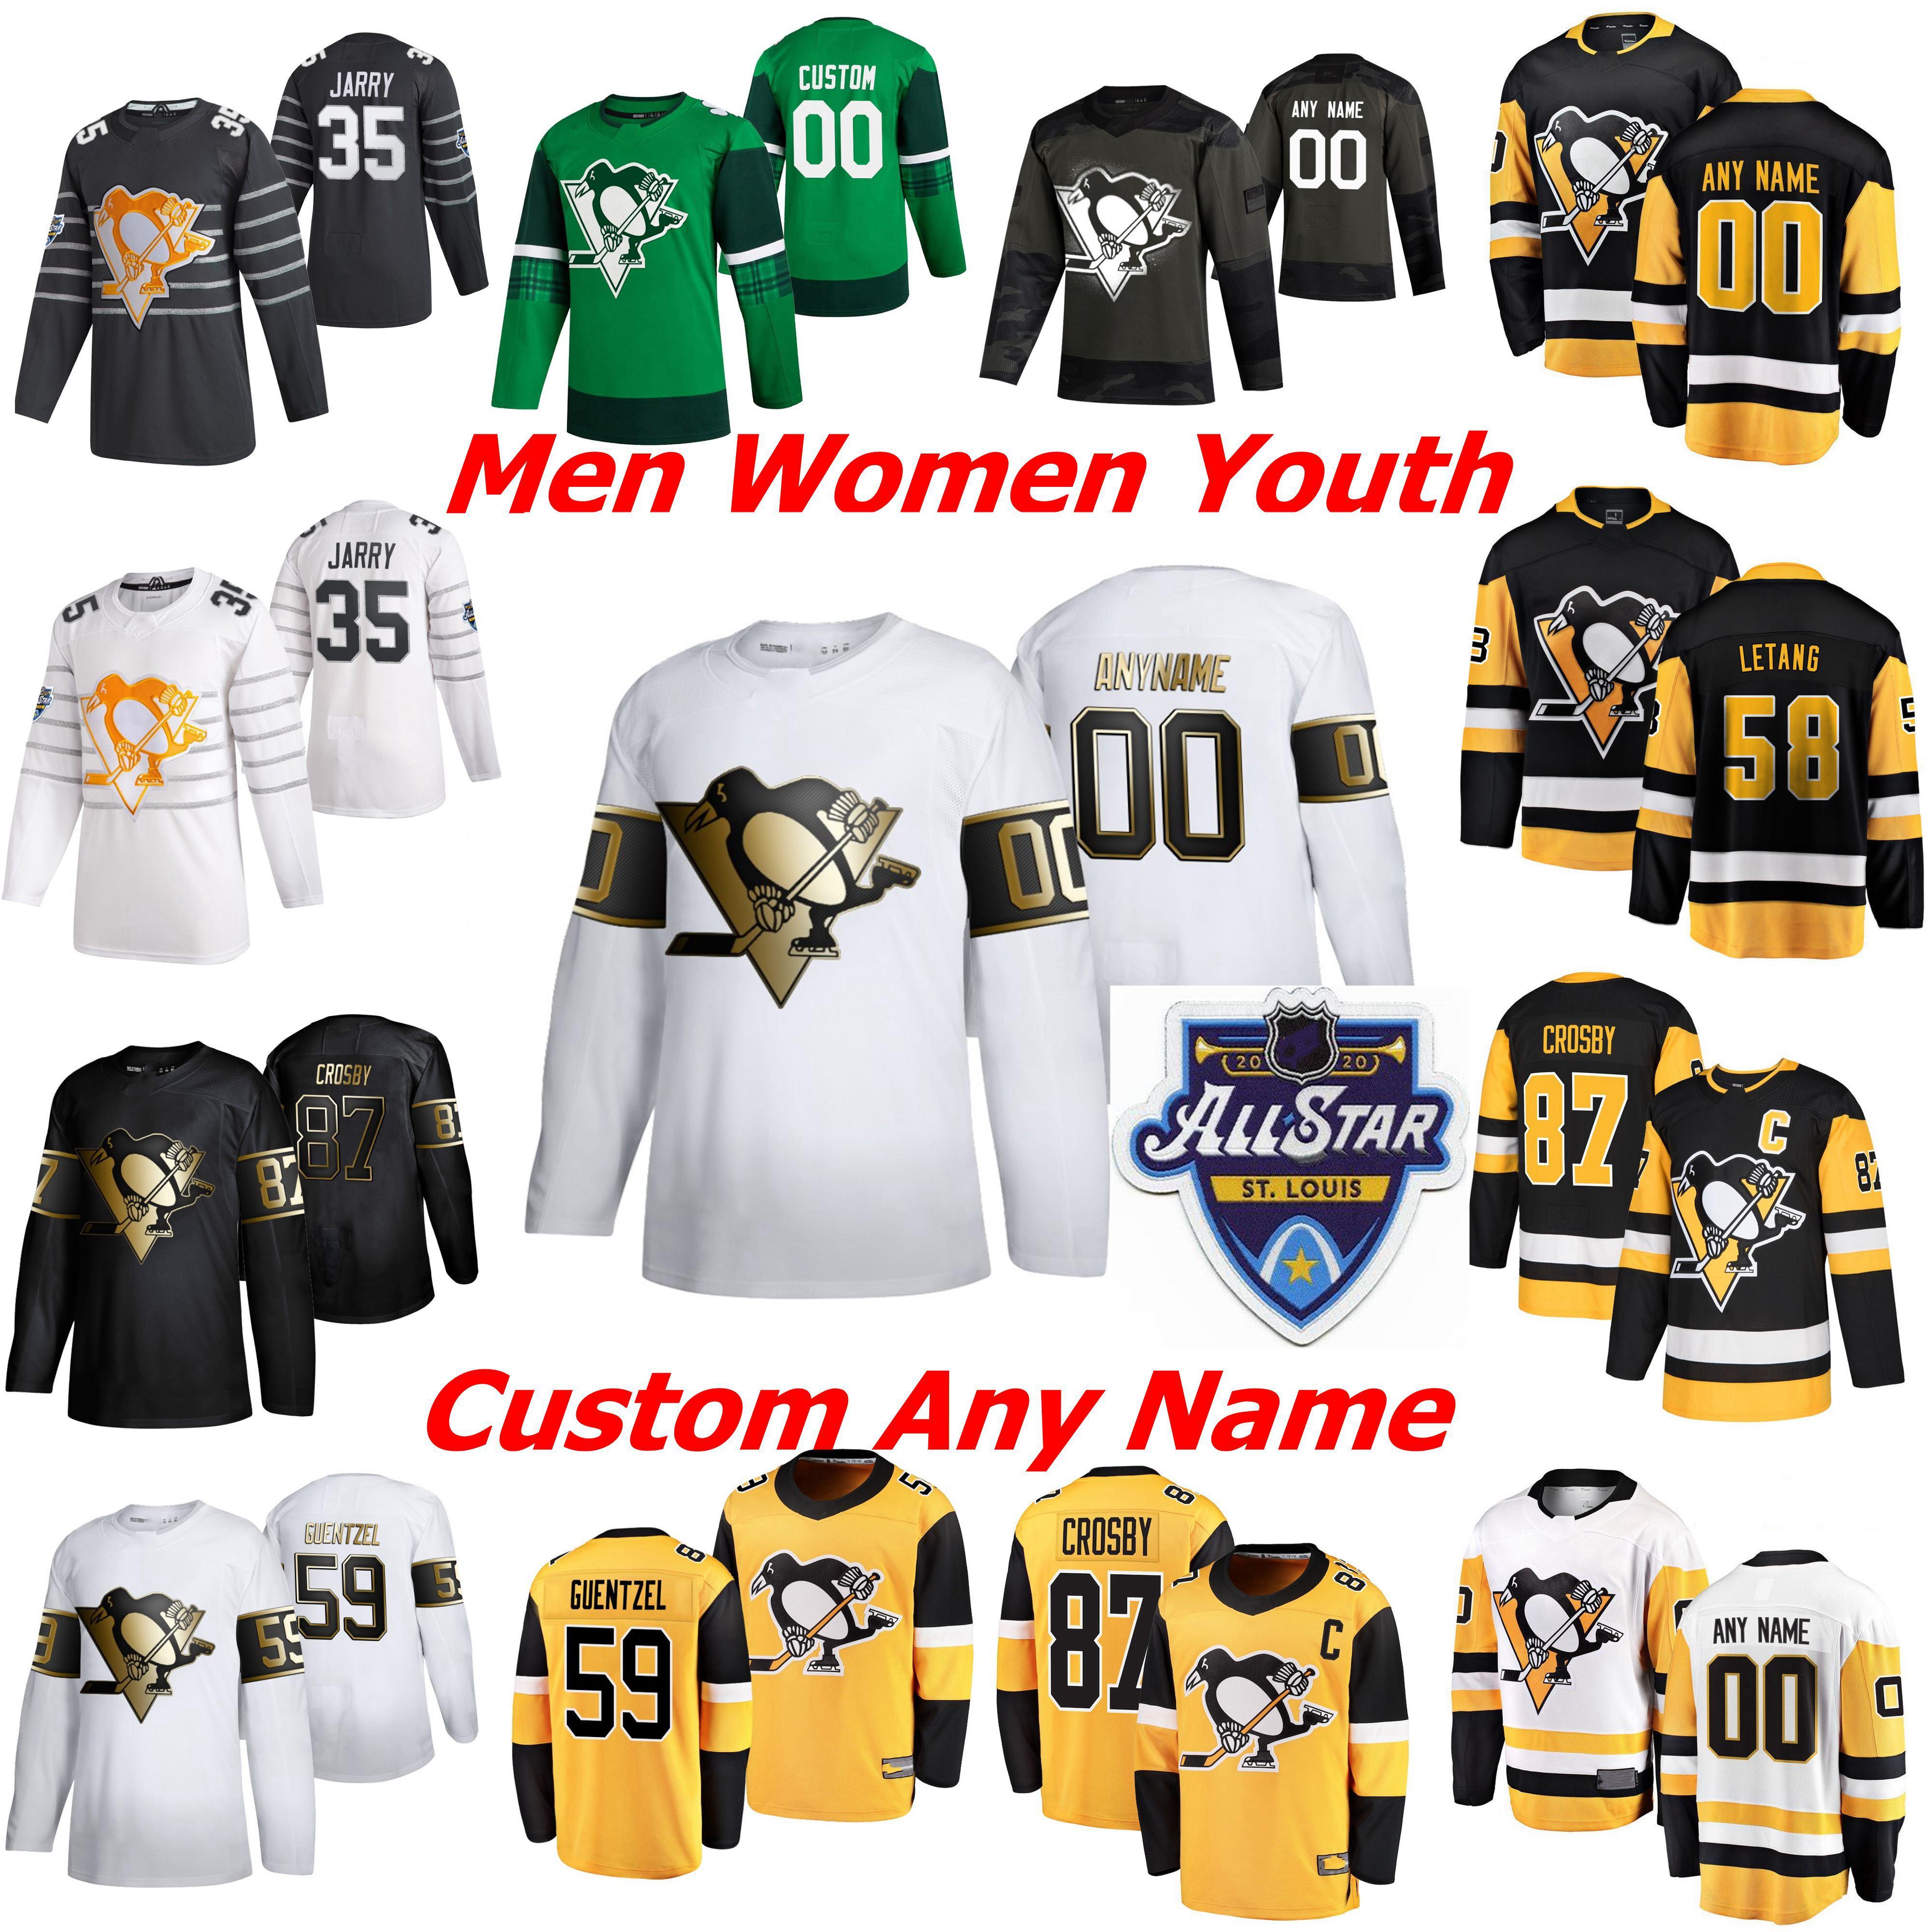 2019 Pittsburgh Penguins Hockey Jerseys Golden Edition Womens 12 Patrick Marleau Jersey 23 Riley Barber 44 Phil Varone Jason ZuckerCustom